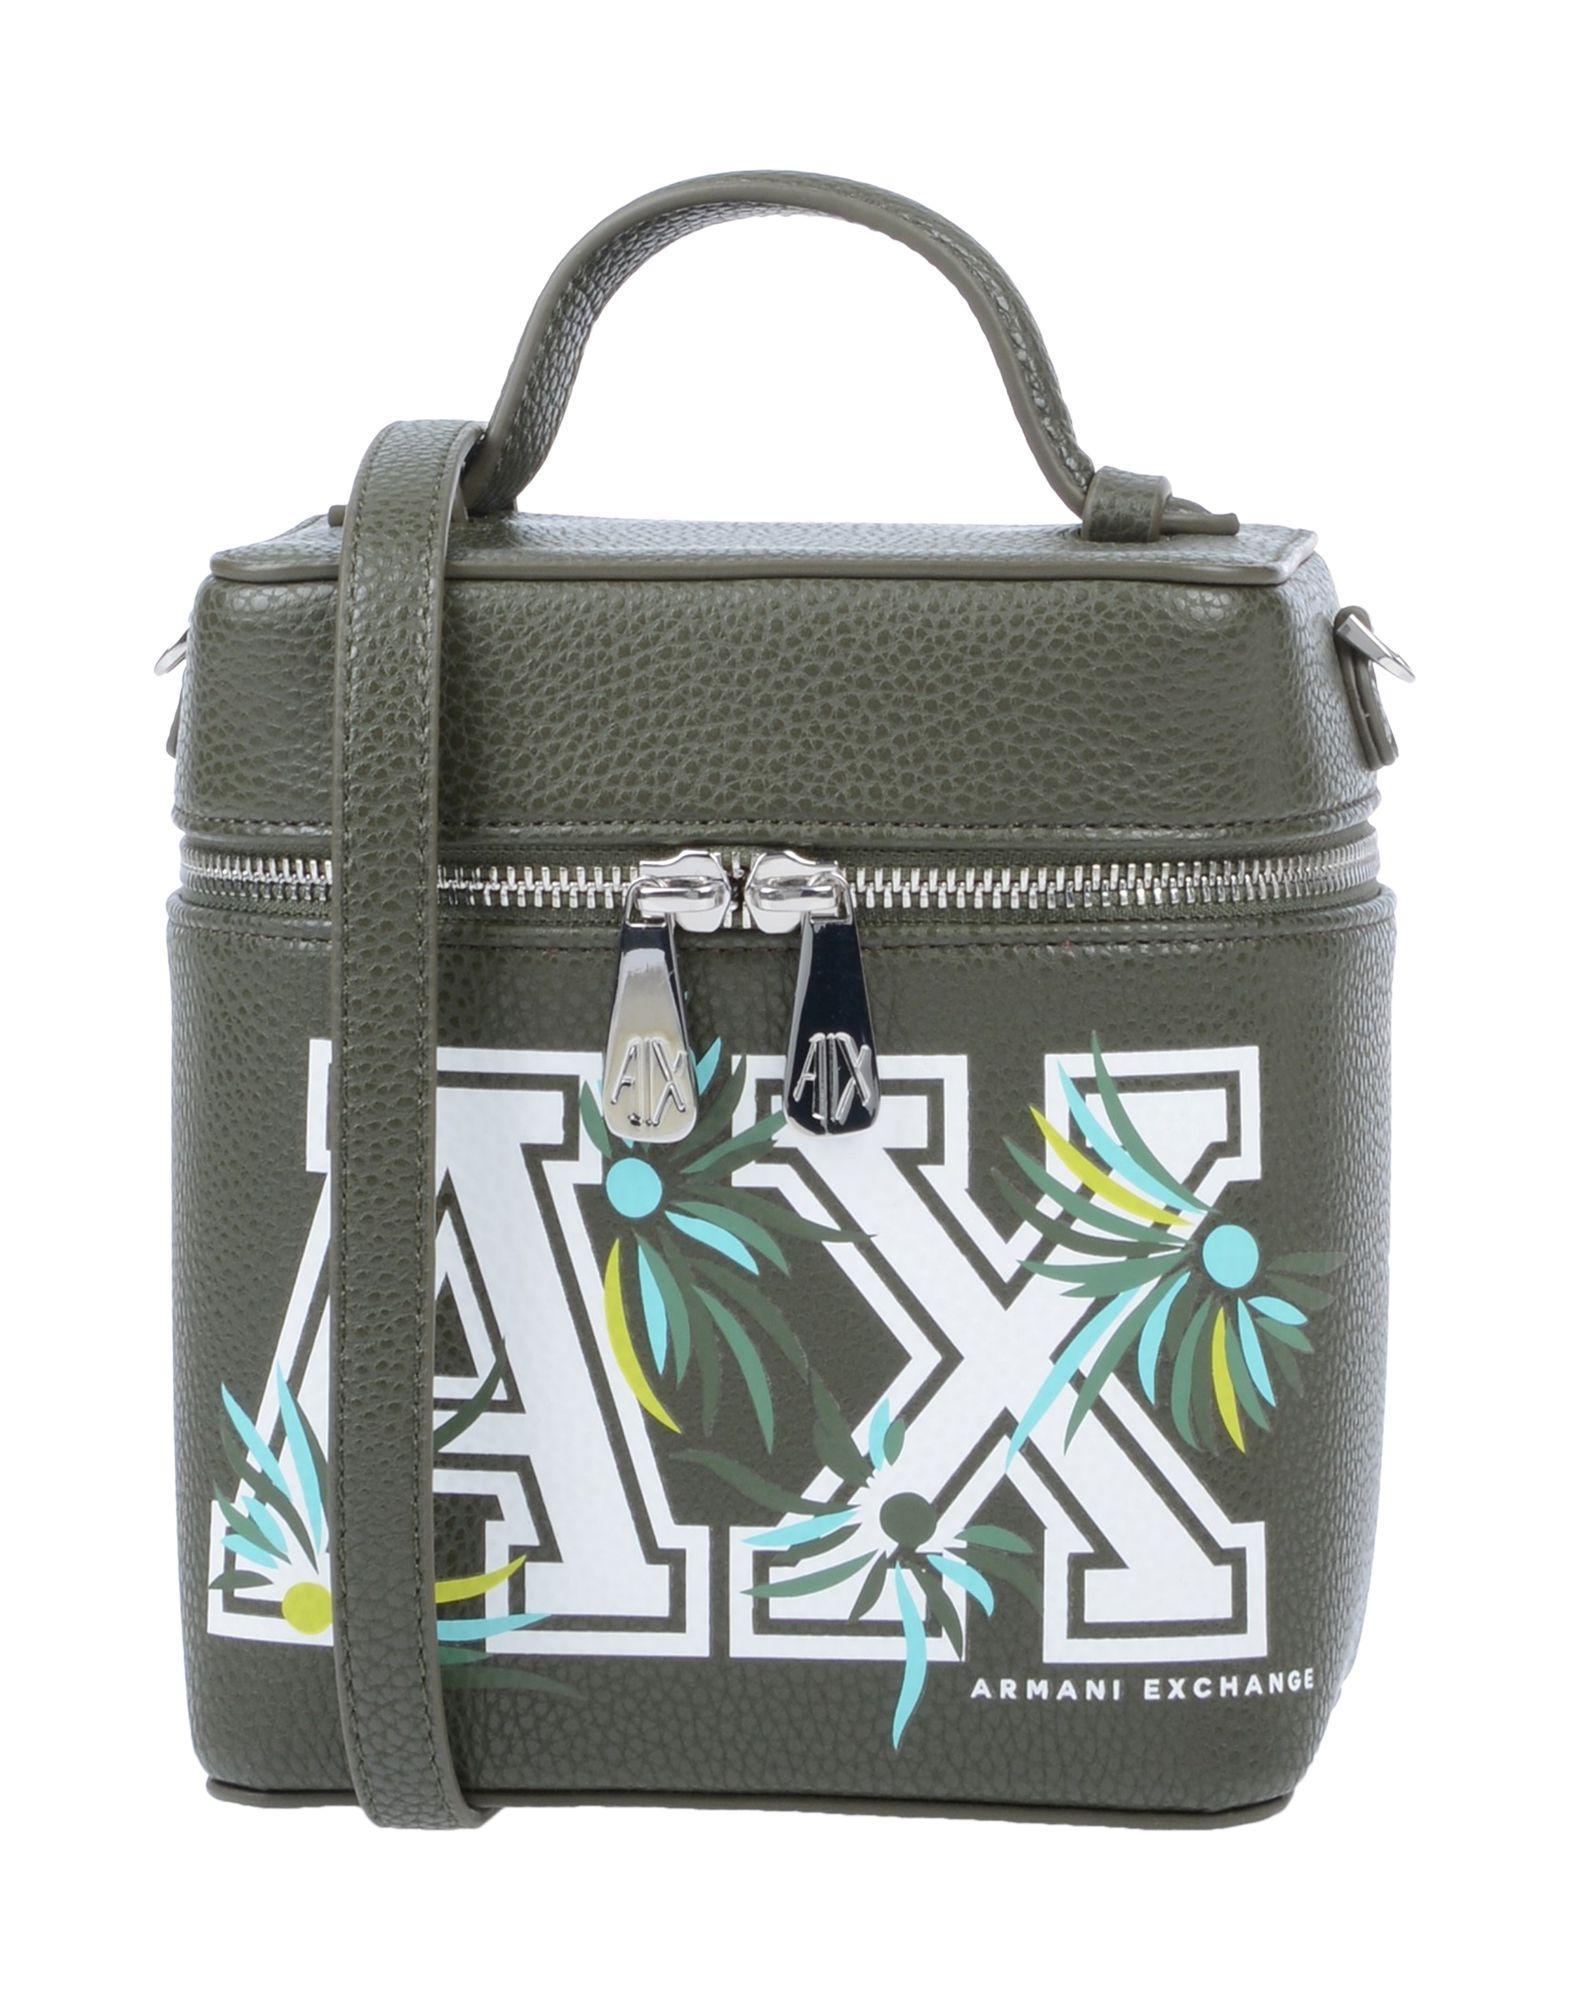 Armani Exchange - Green Handbag - Lyst. View fullscreen 5b5de287787c2